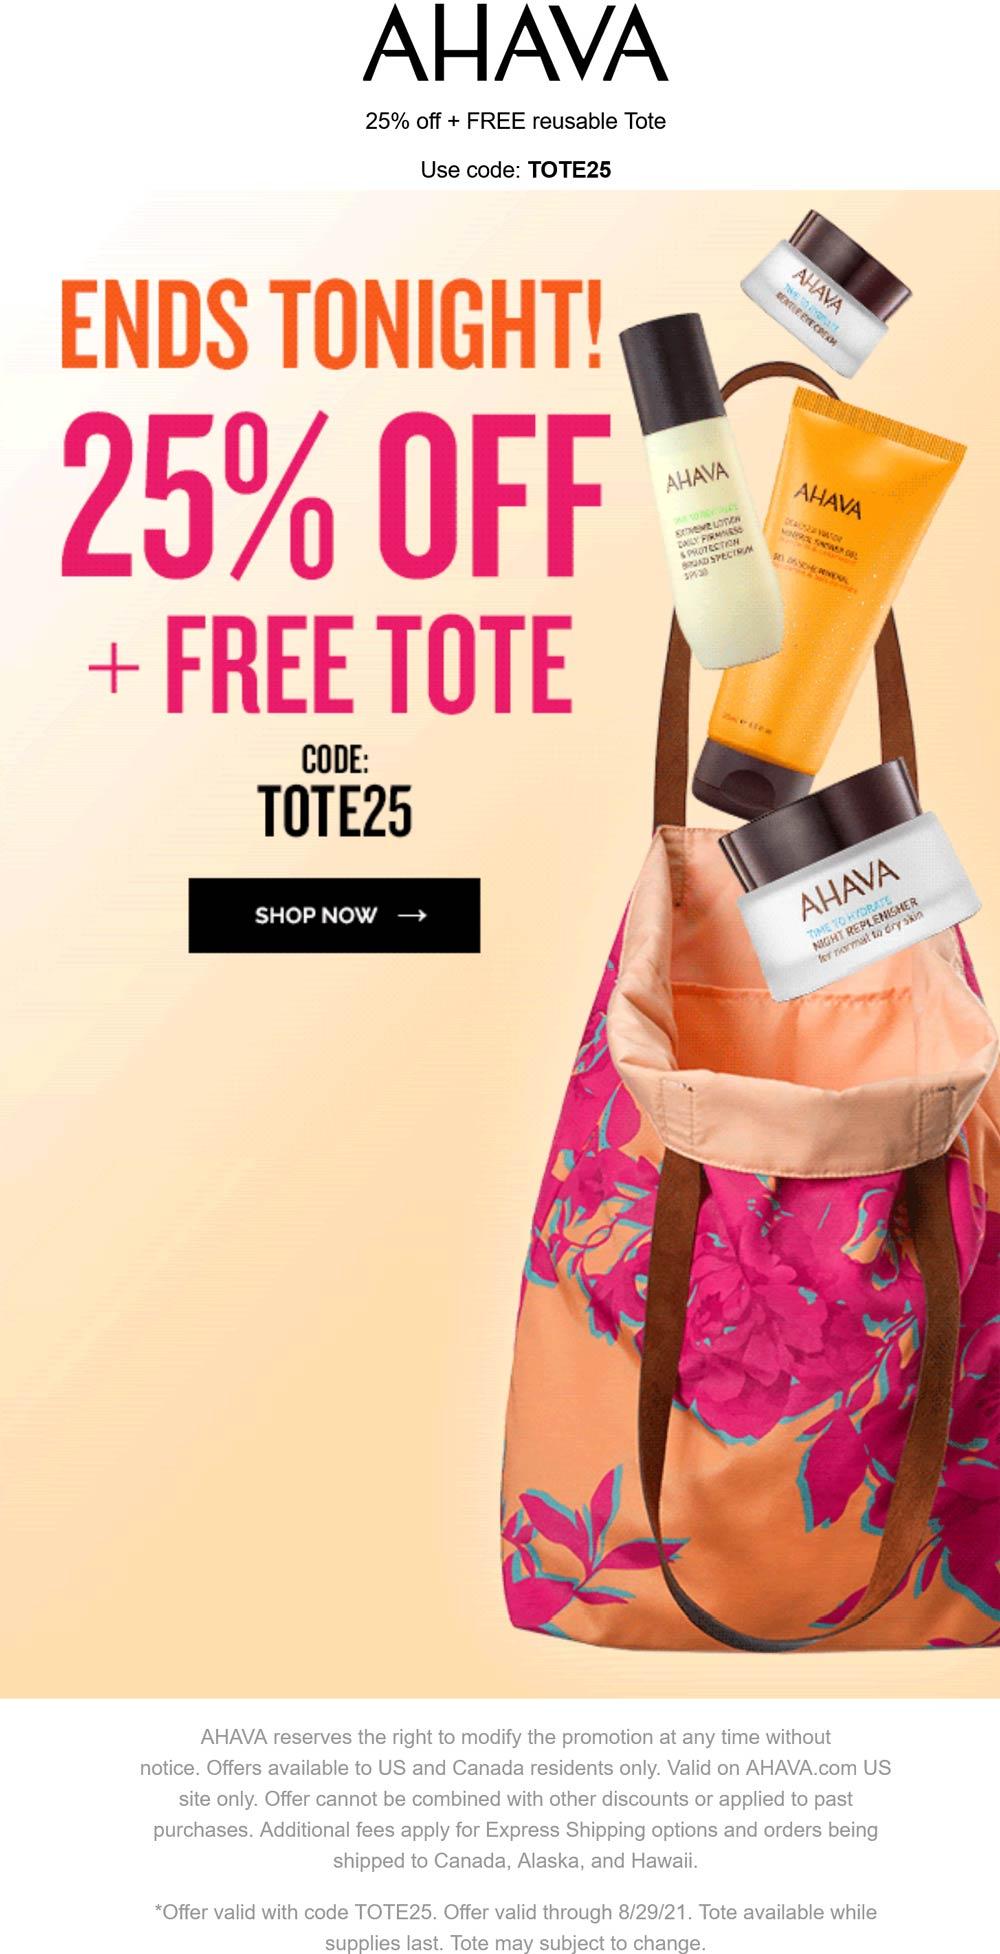 AHAVA stores Coupon  25% off + free tote bag today at AHAVA cosmetics via promo code TOTE25 #ahava